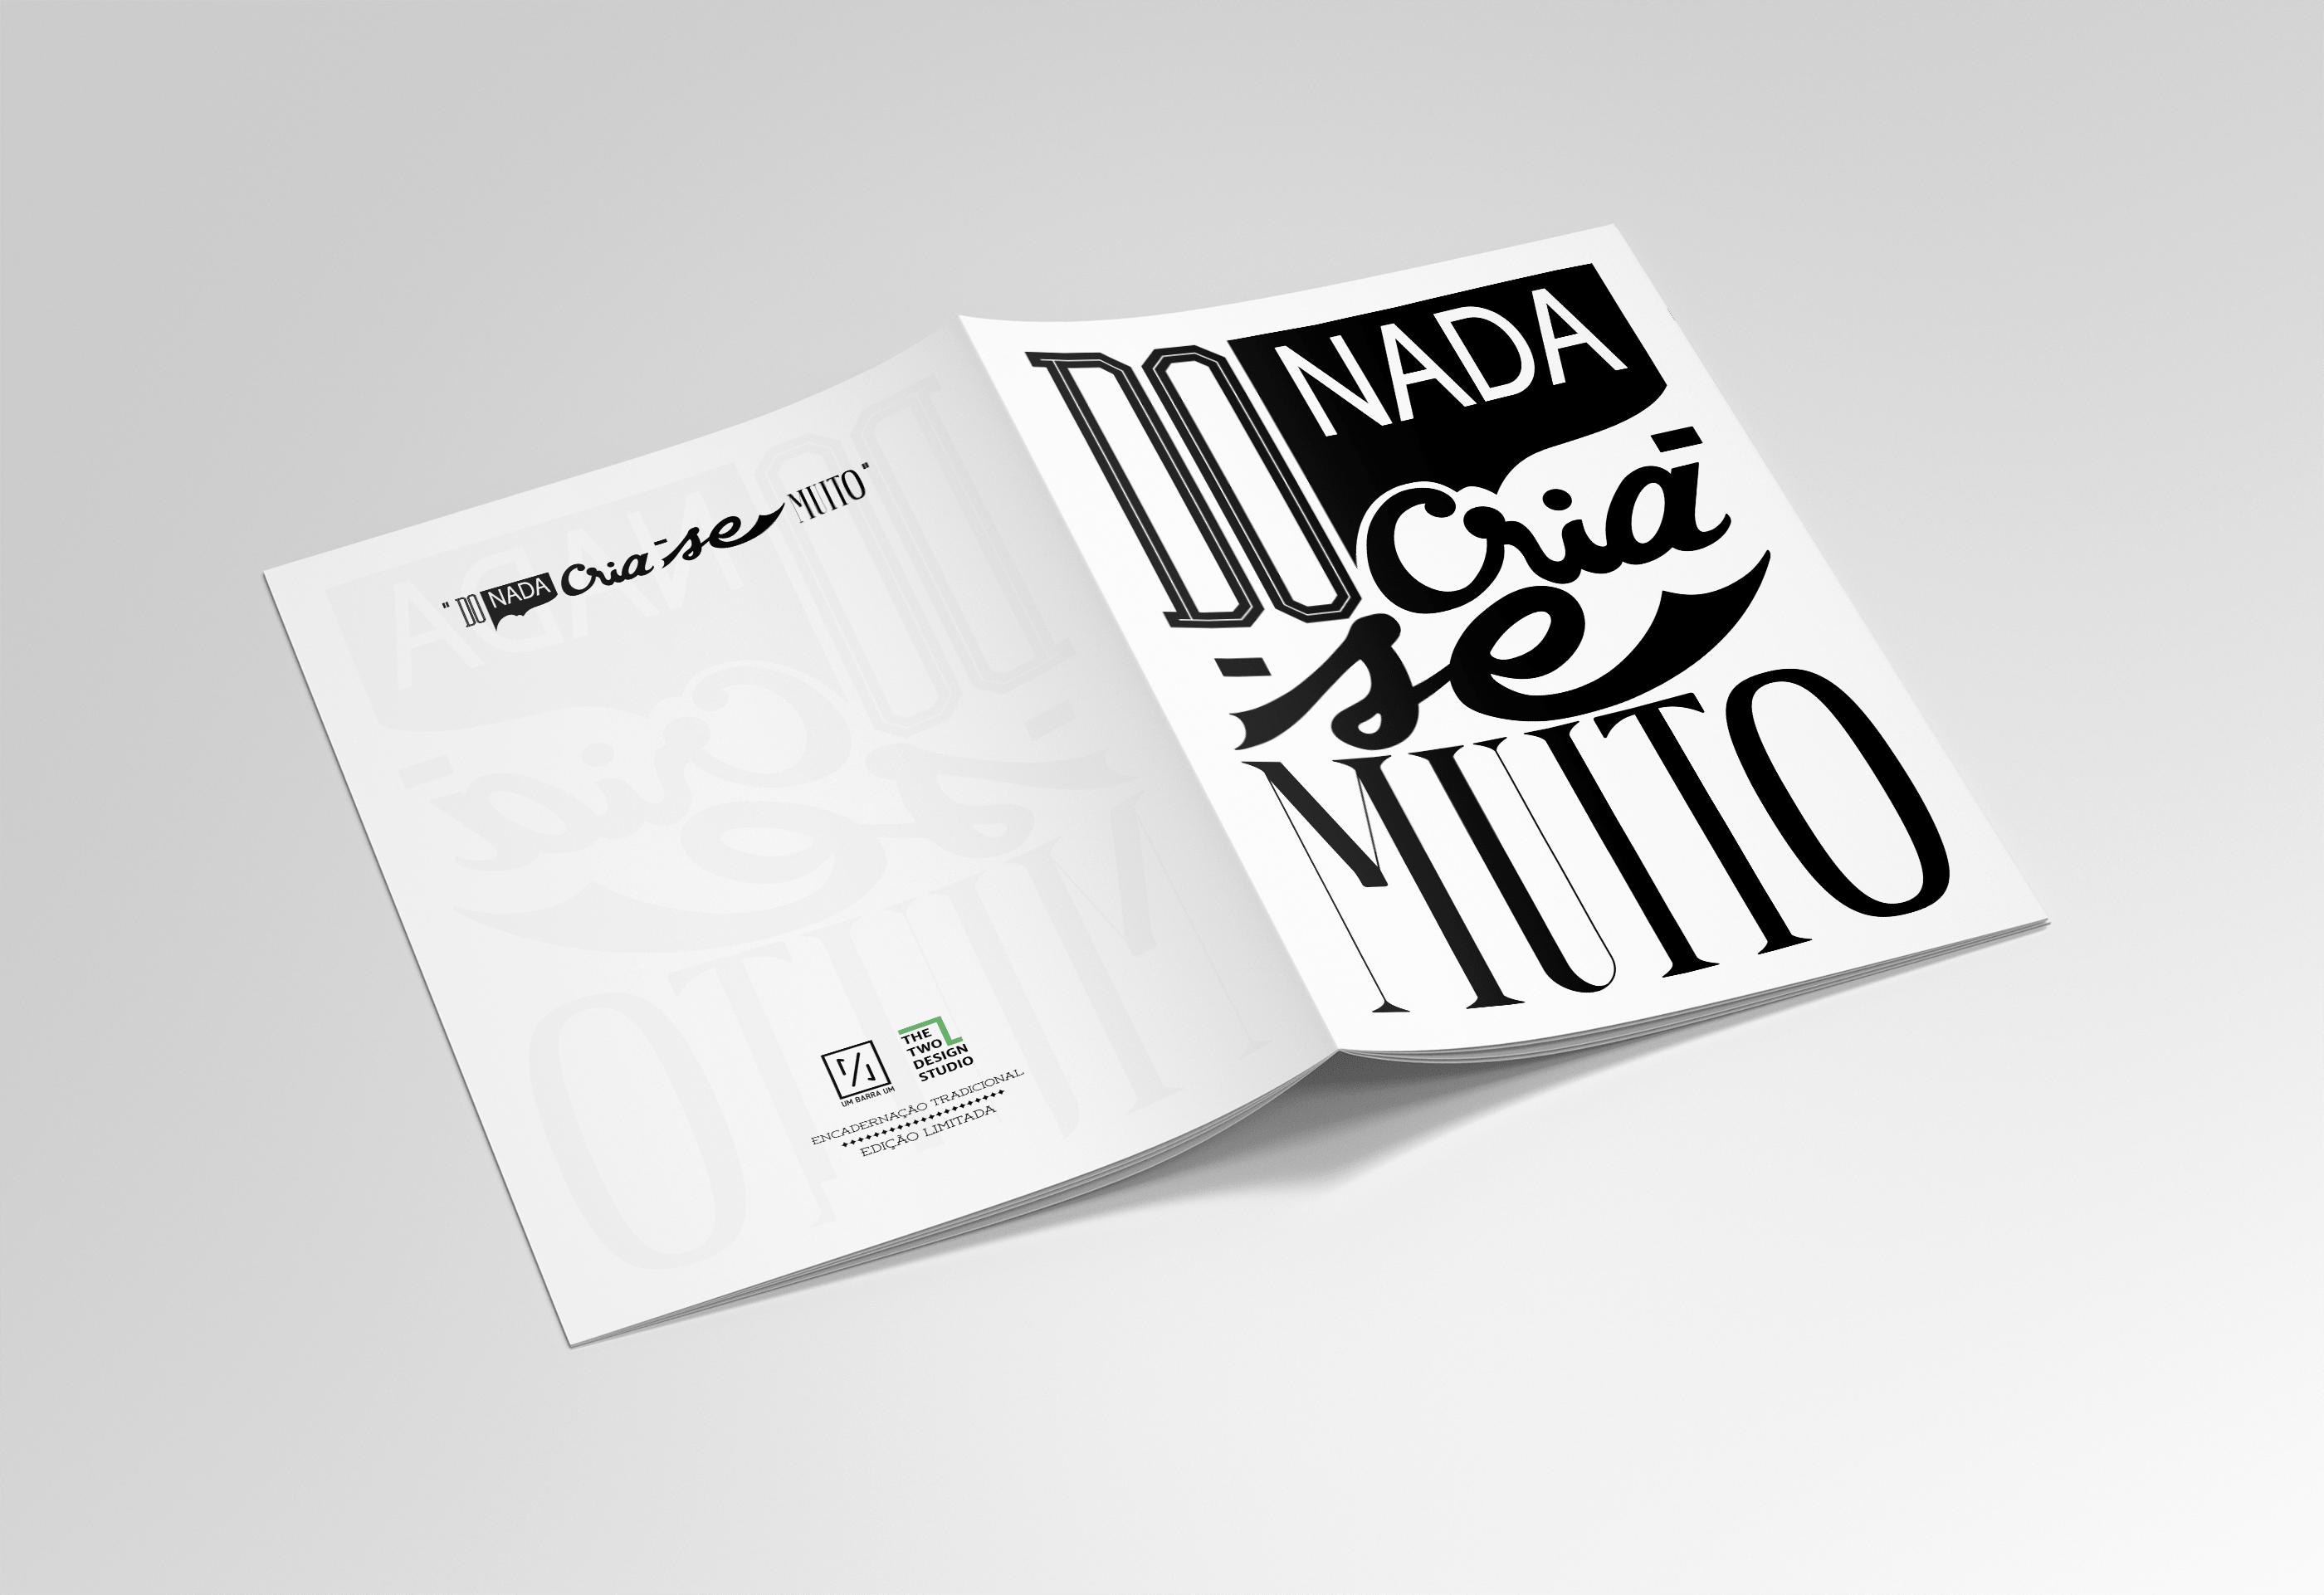 Concept design for a notebook